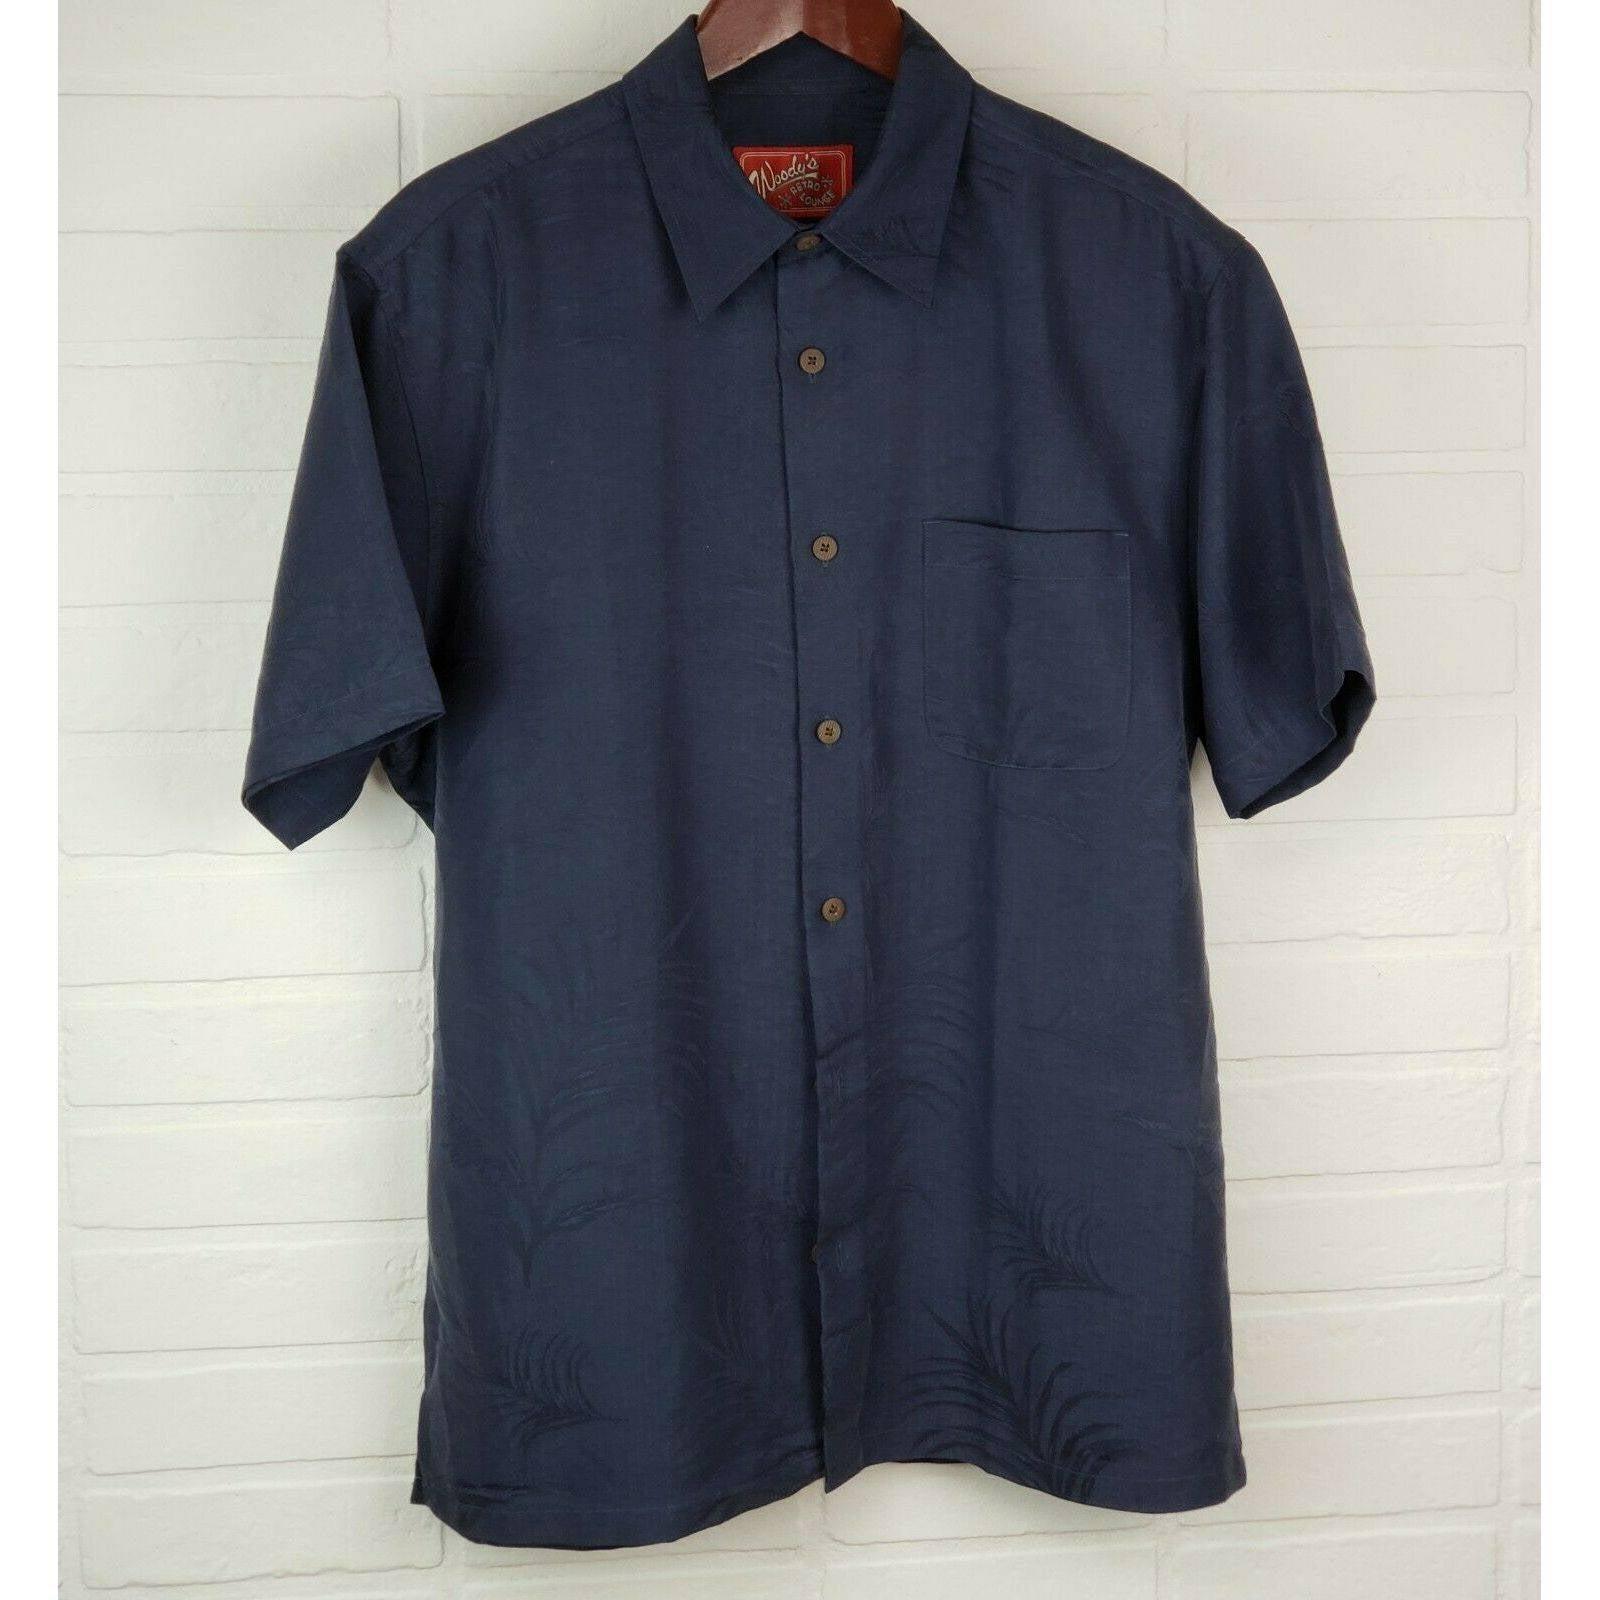 Woodys Retro Lounge M Hawaiian Shirt